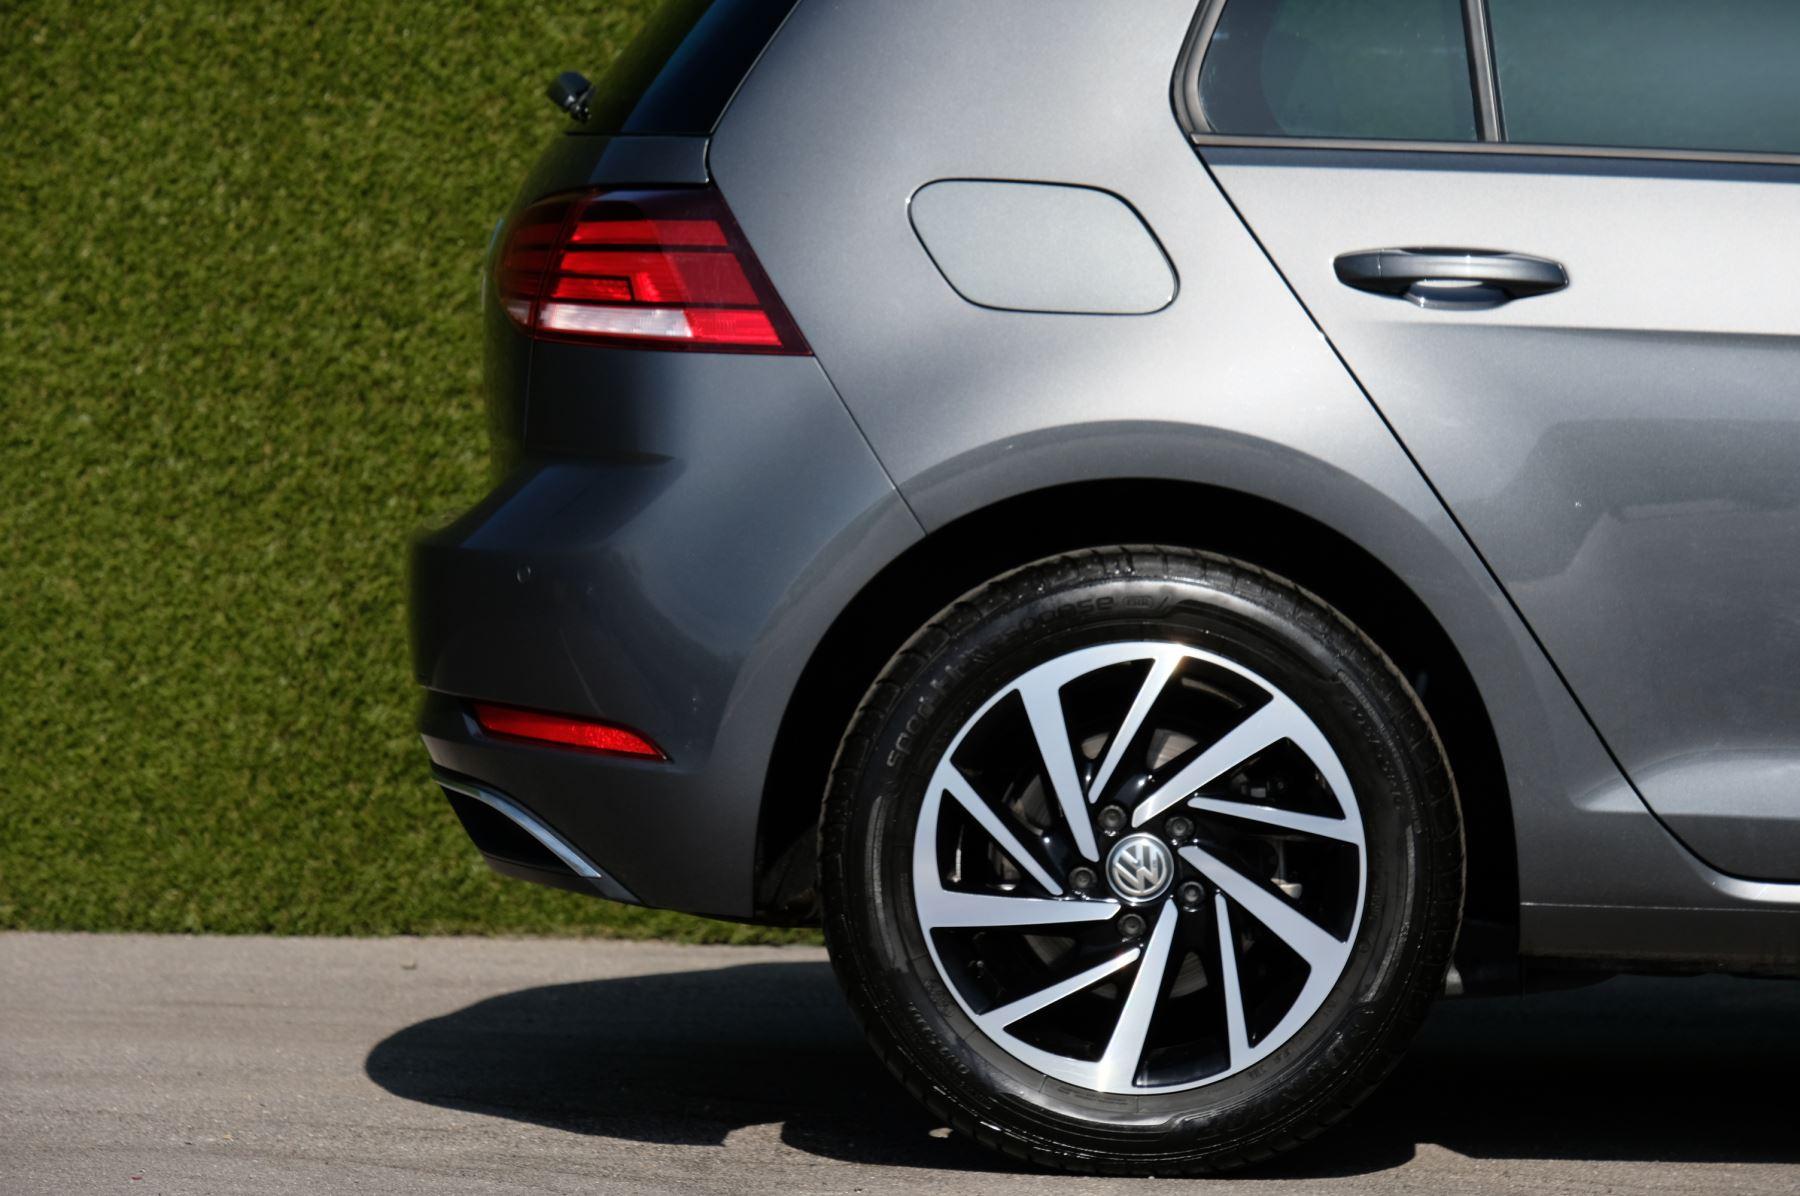 Volkswagen Golf 1.5 TSI EVO 150hp Match 5 Door DSG Auto with A/Con, Sat Nav, Alloys & Adaptive Cruise  image 9